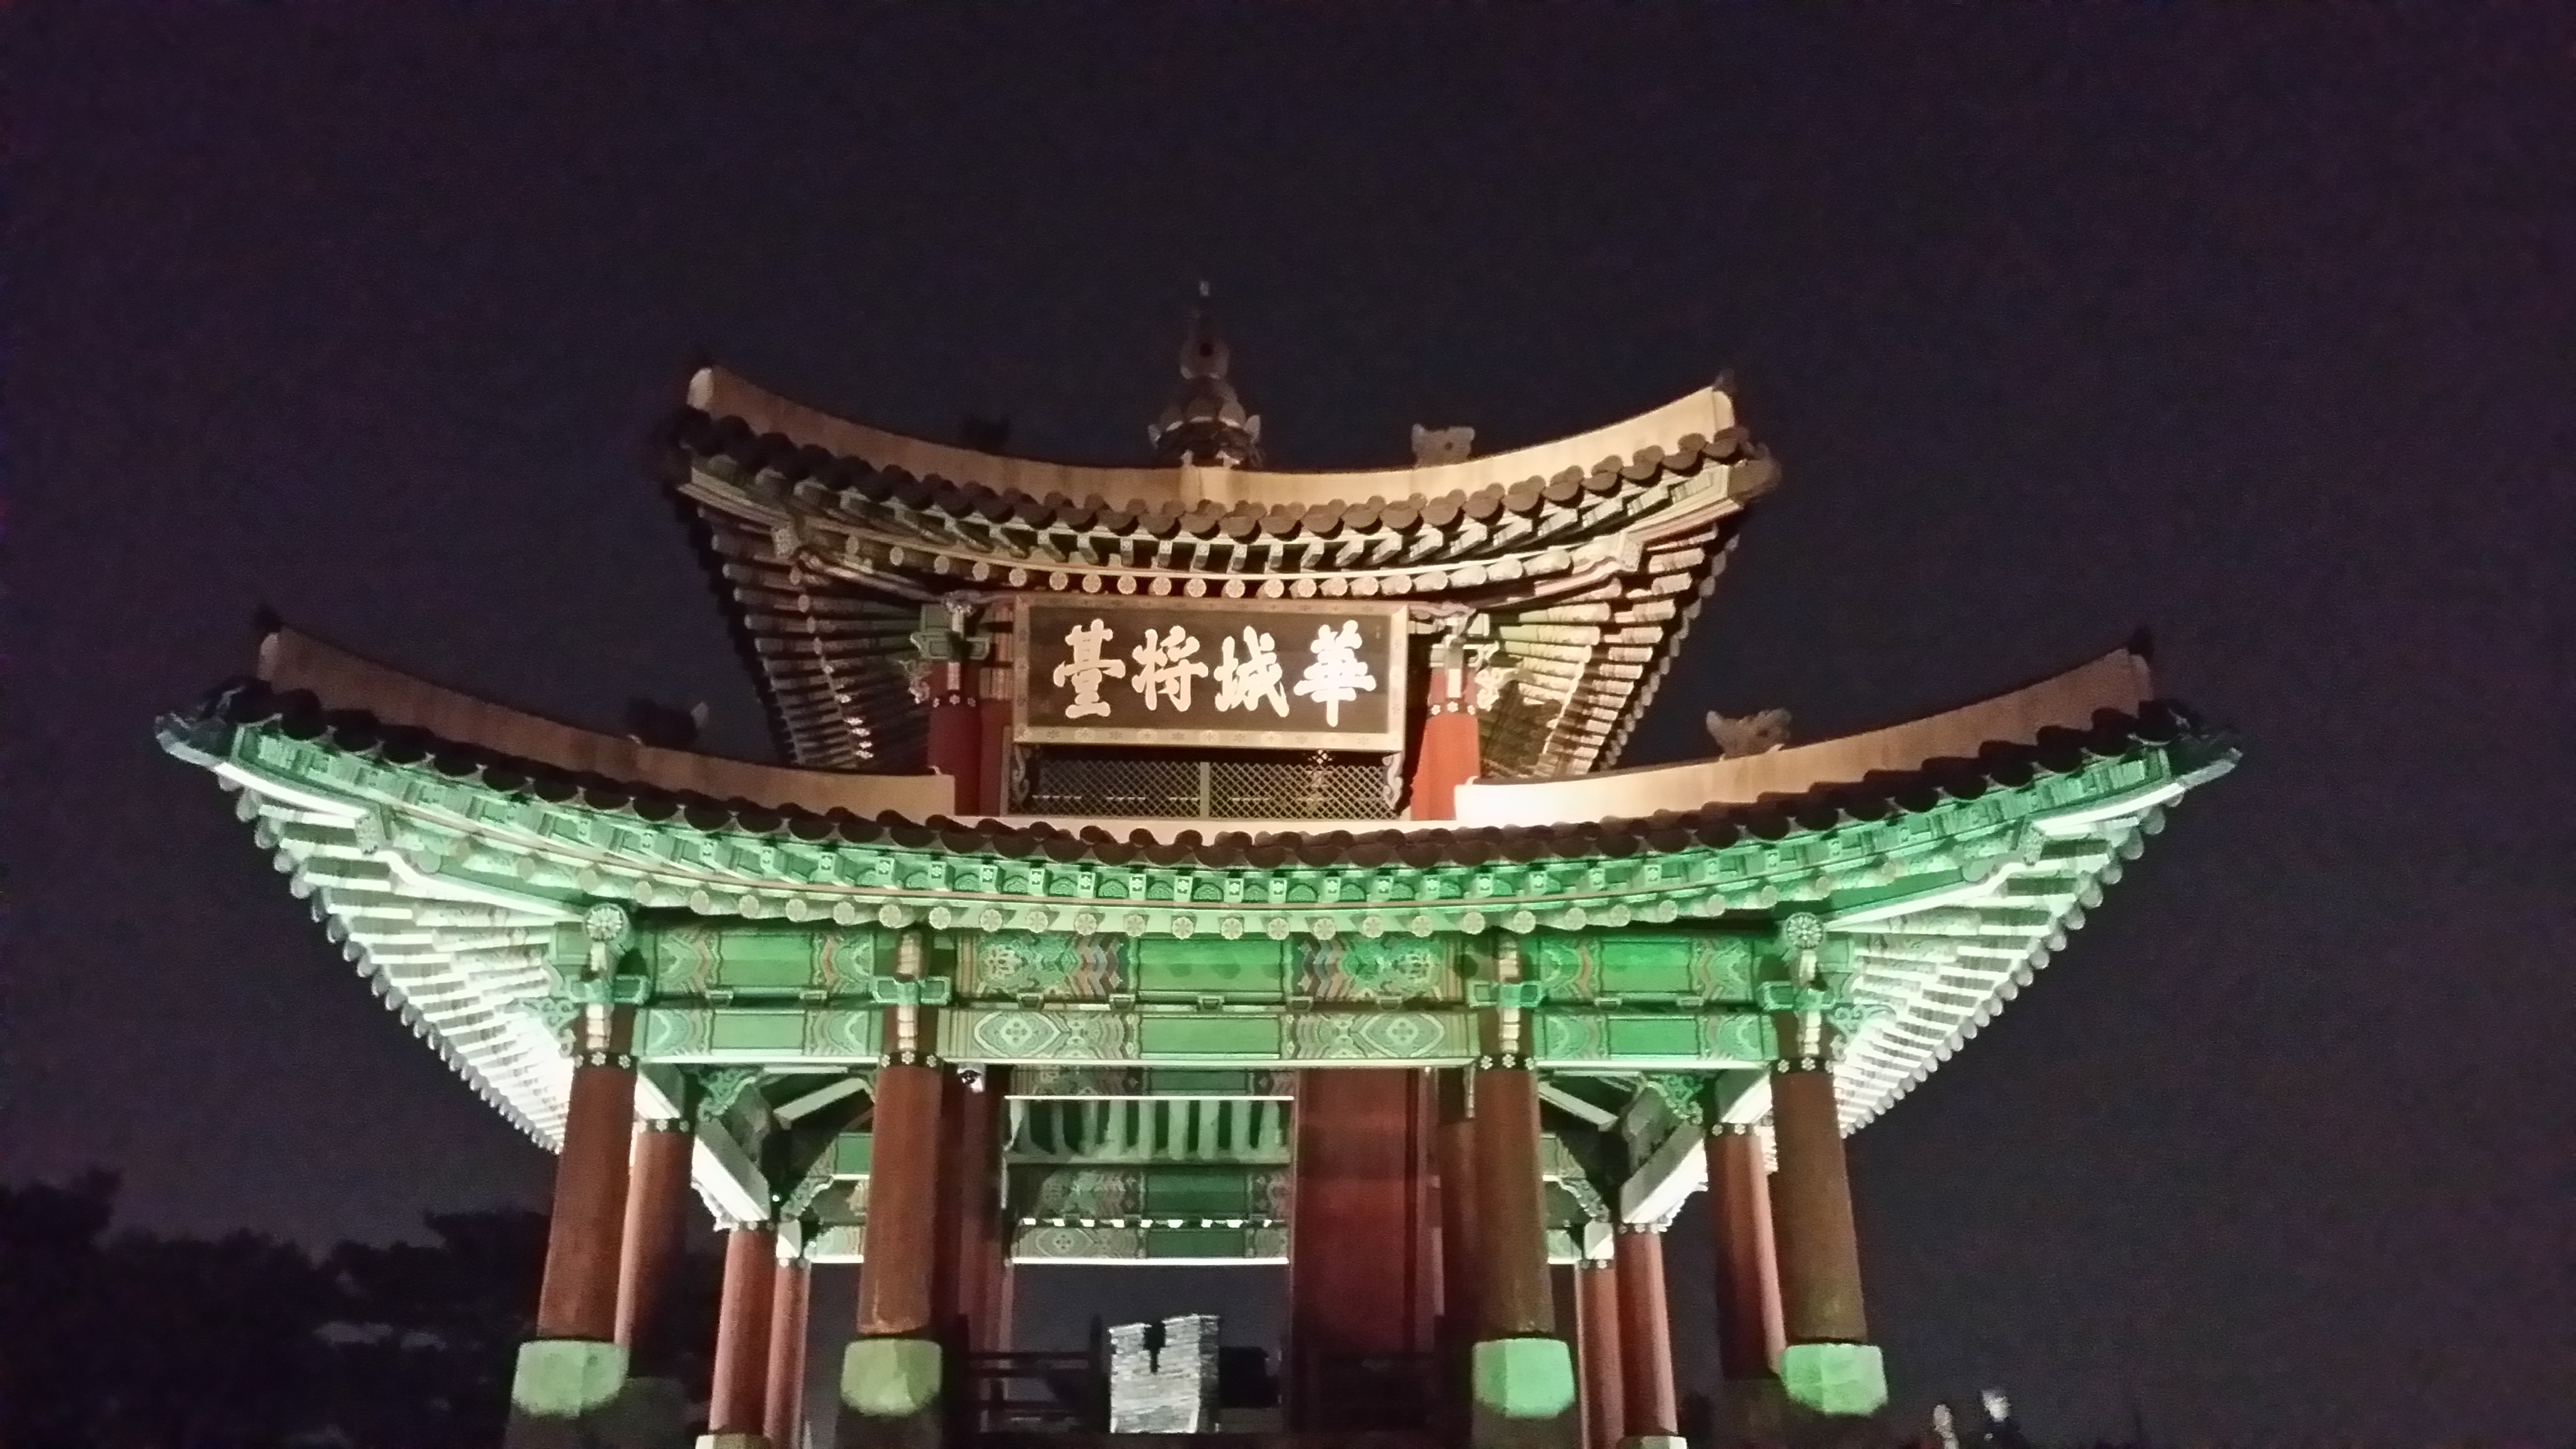 Brilliant Fortress Hwaseong Fortress - Republic of Korea (South Korea) Vidya Charan